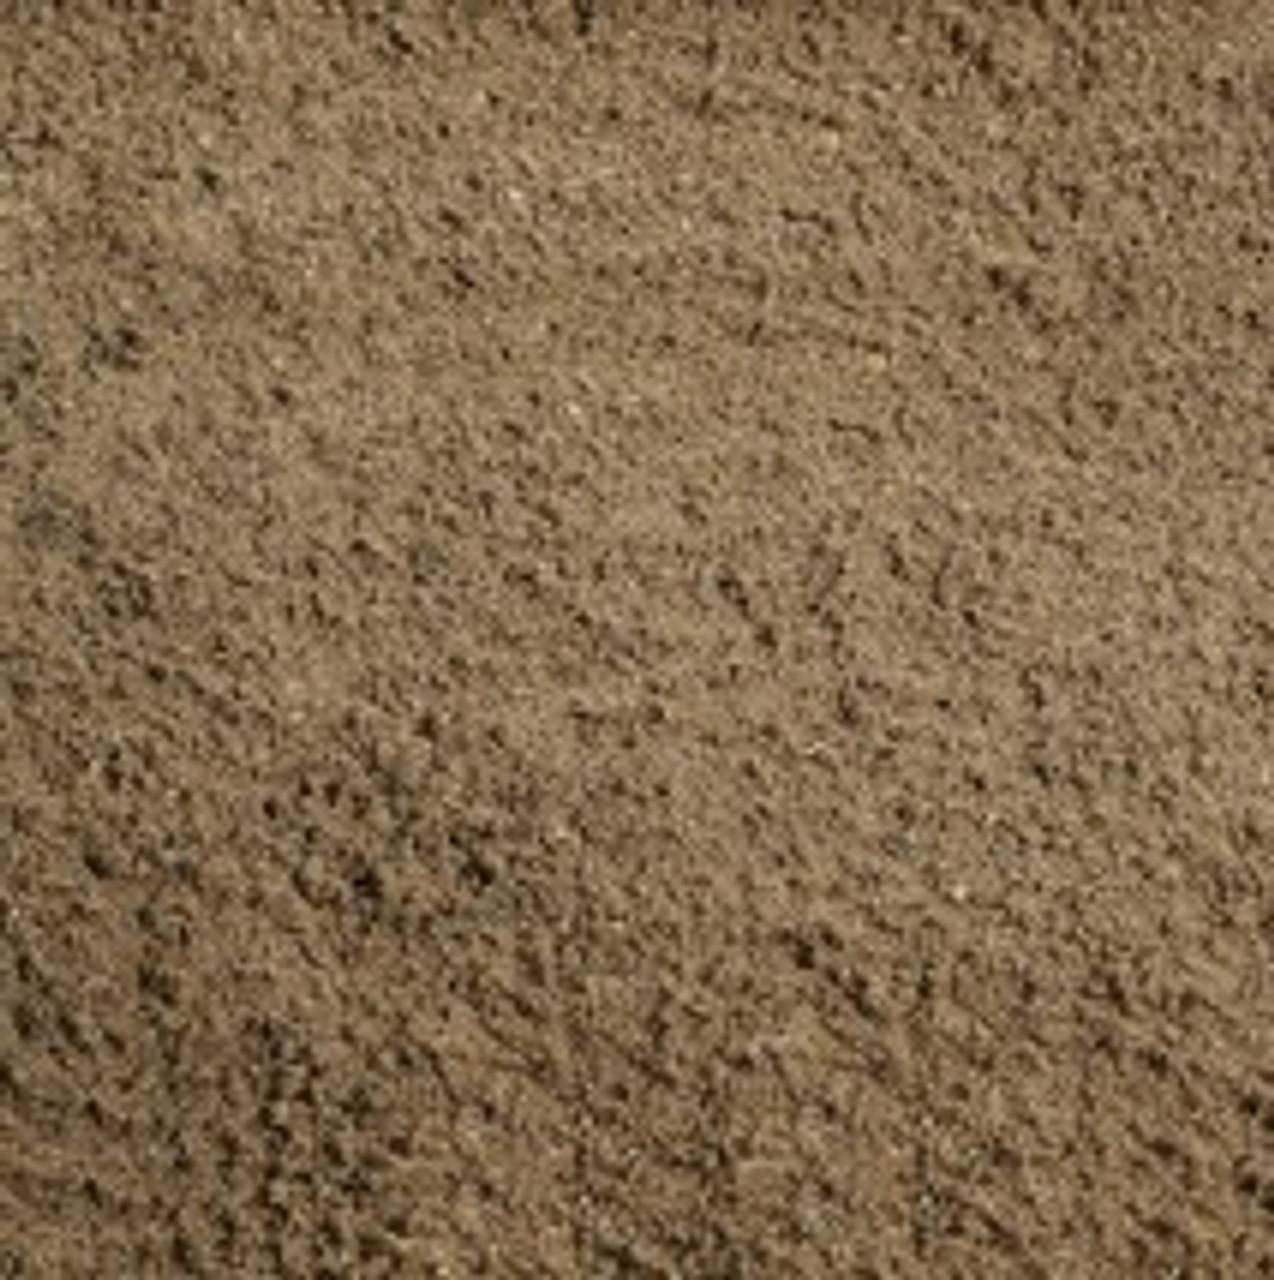 Sandy Loam Compost Soil